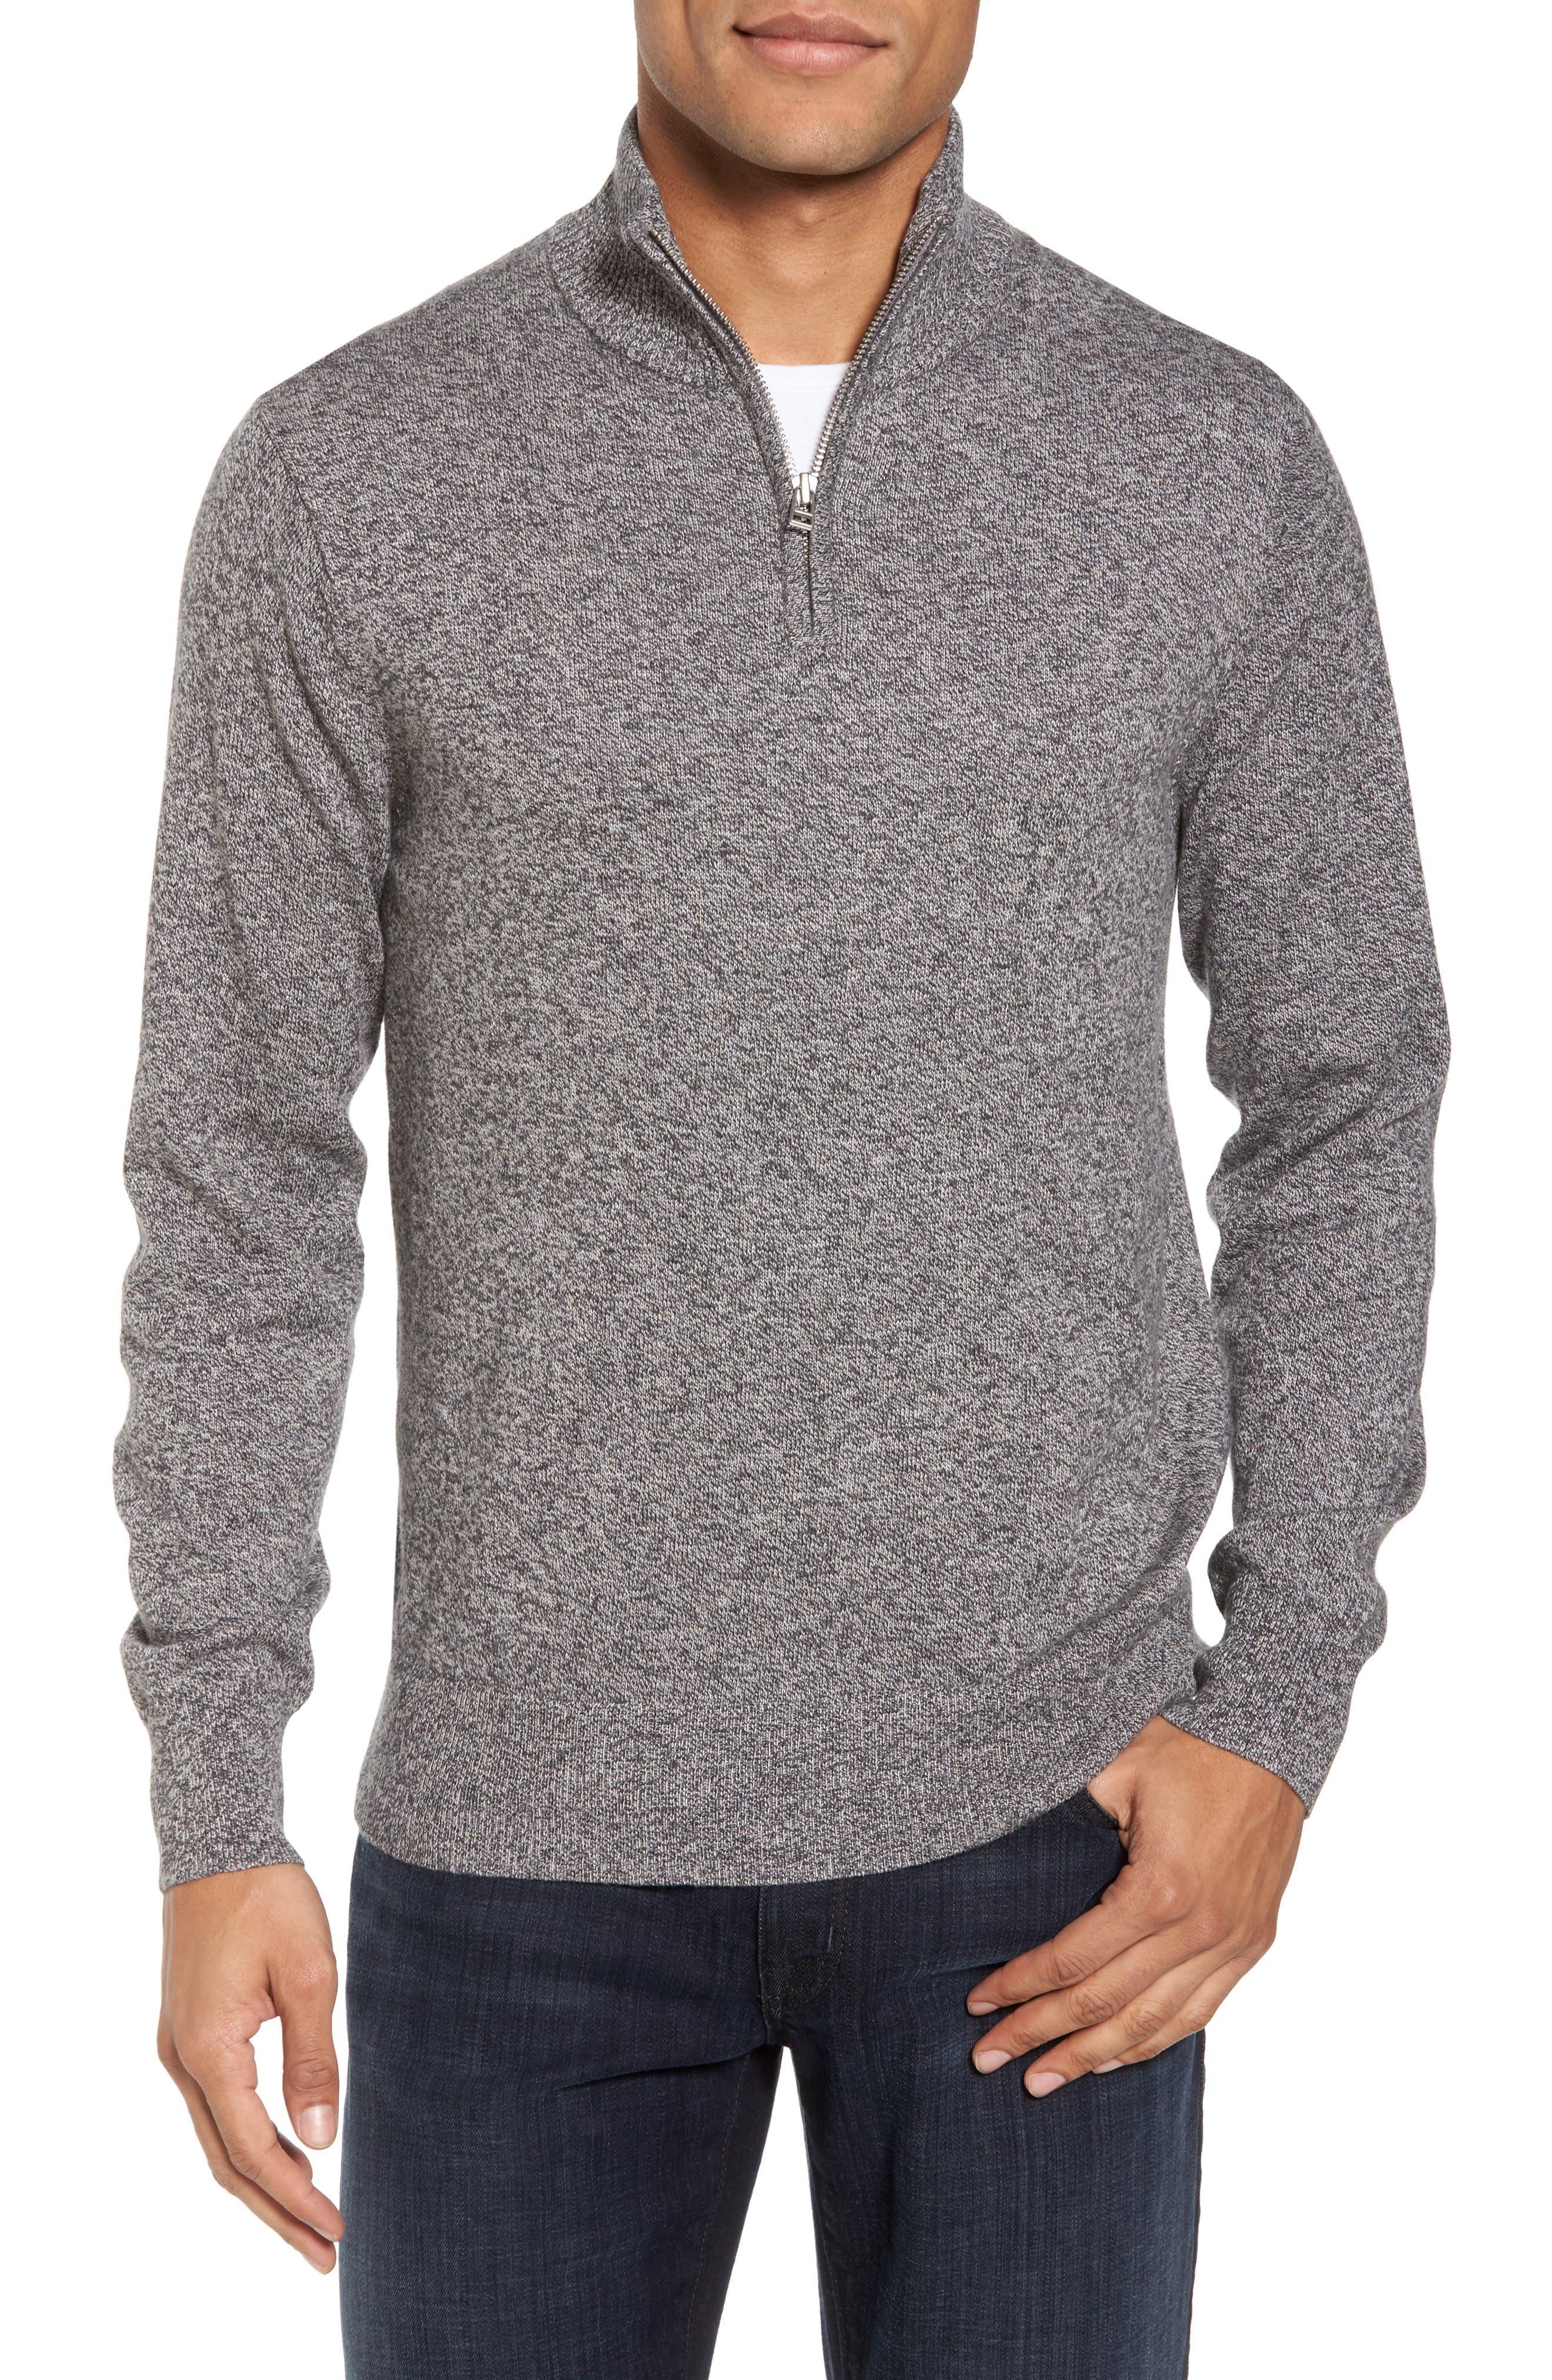 Bonobos Cotton & Cashmere Quarter Zip Sweater